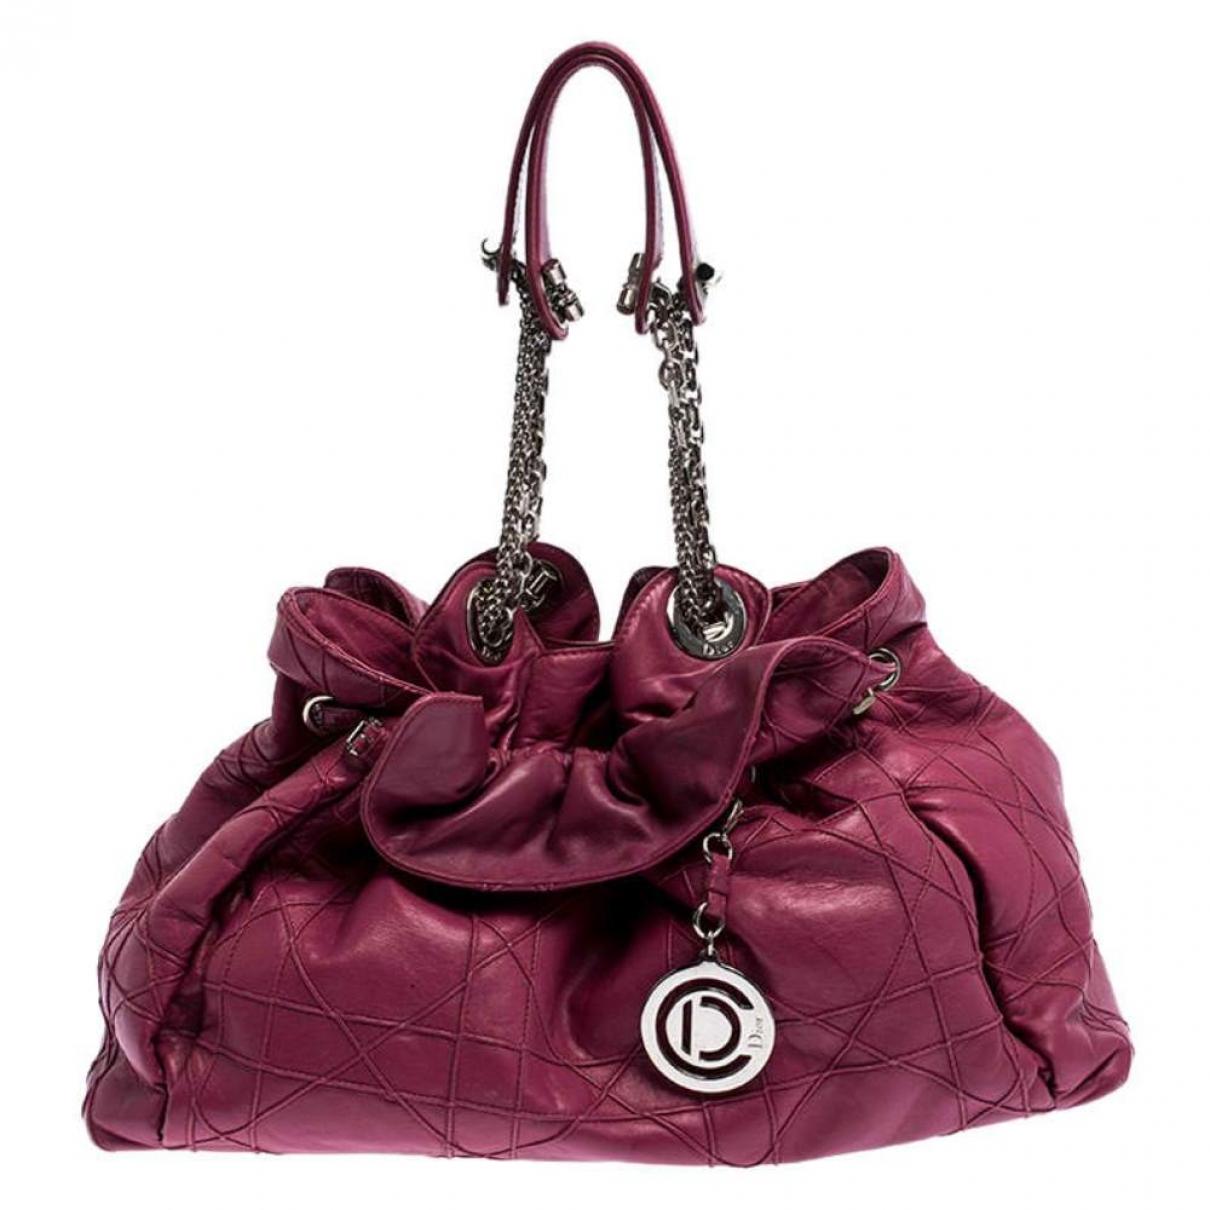 Dior - Sac a main Le Trente pour femme en cuir - rose